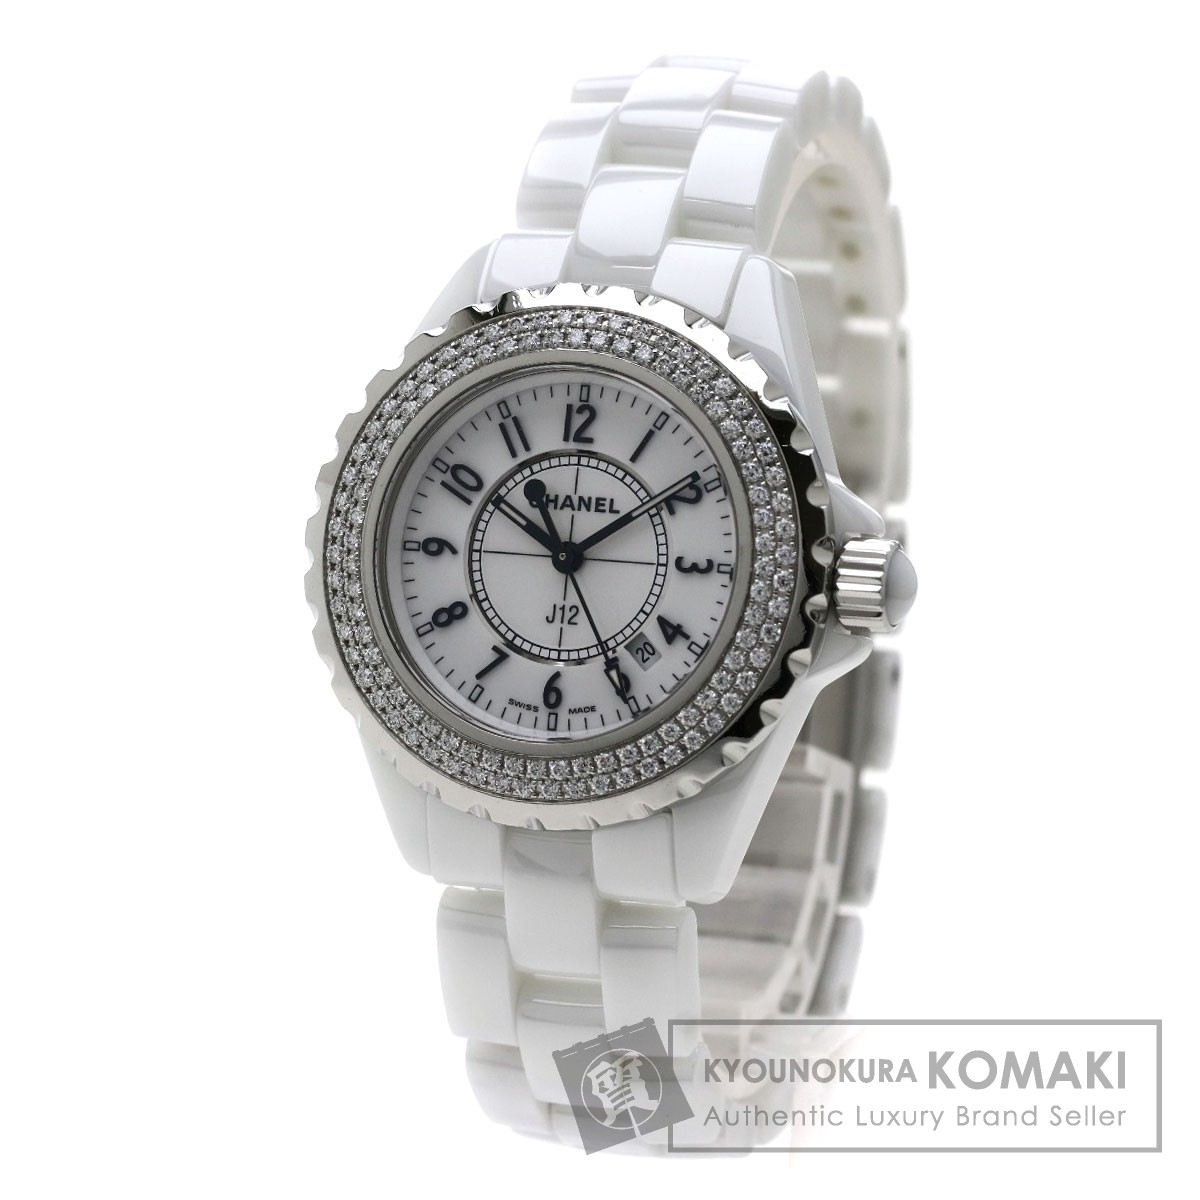 CHANEL H0967 J12 33 腕時計 セラミック/セラミック/ダイヤモンド レディース 【中古】【シャネル】